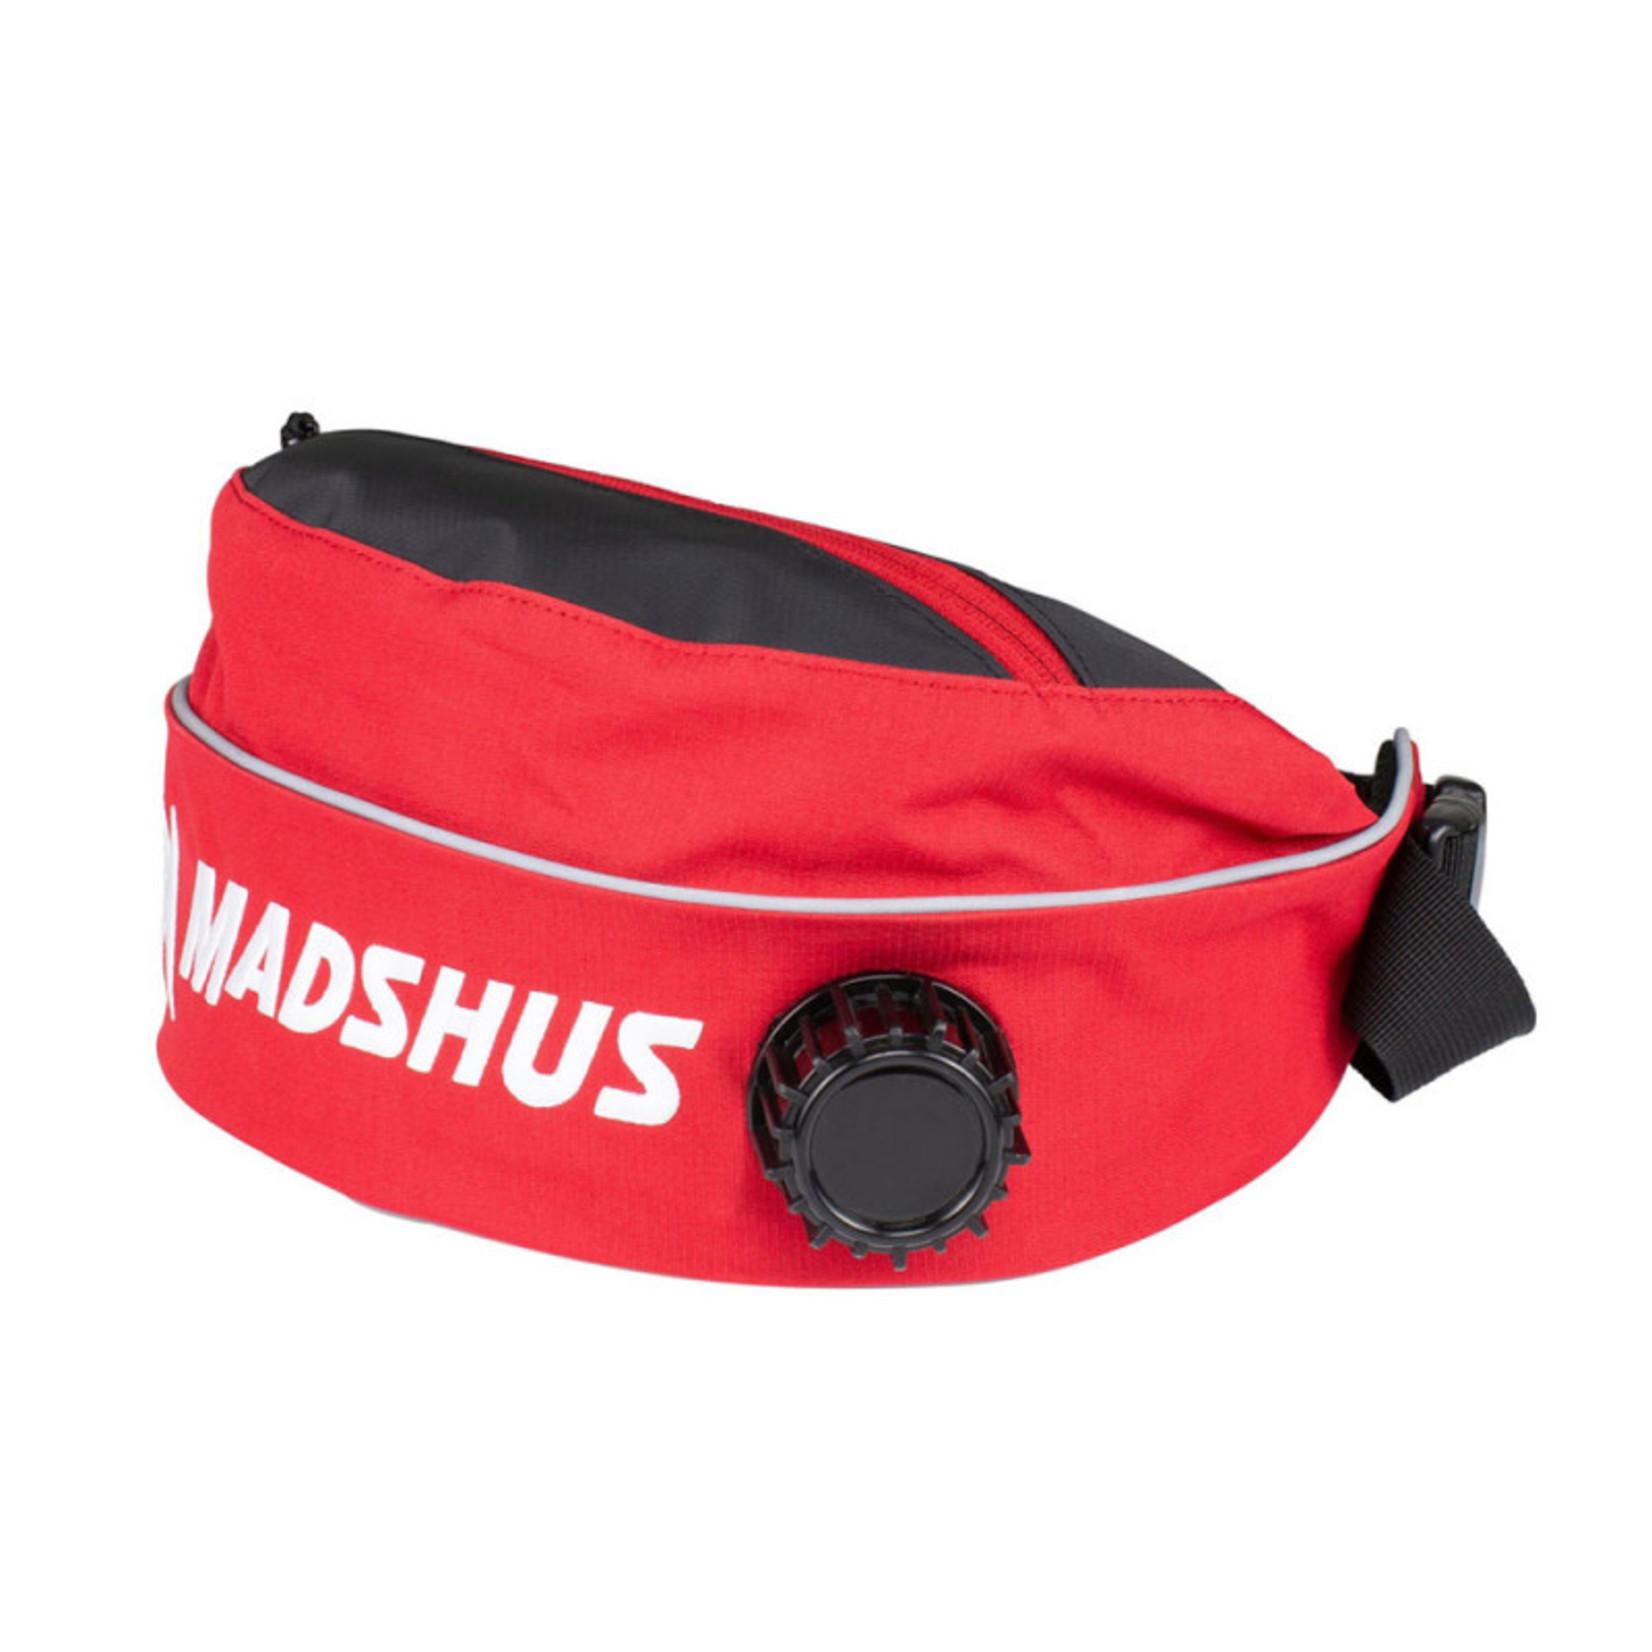 Madshus Madshus Thermobelt Insulated Drink Belt